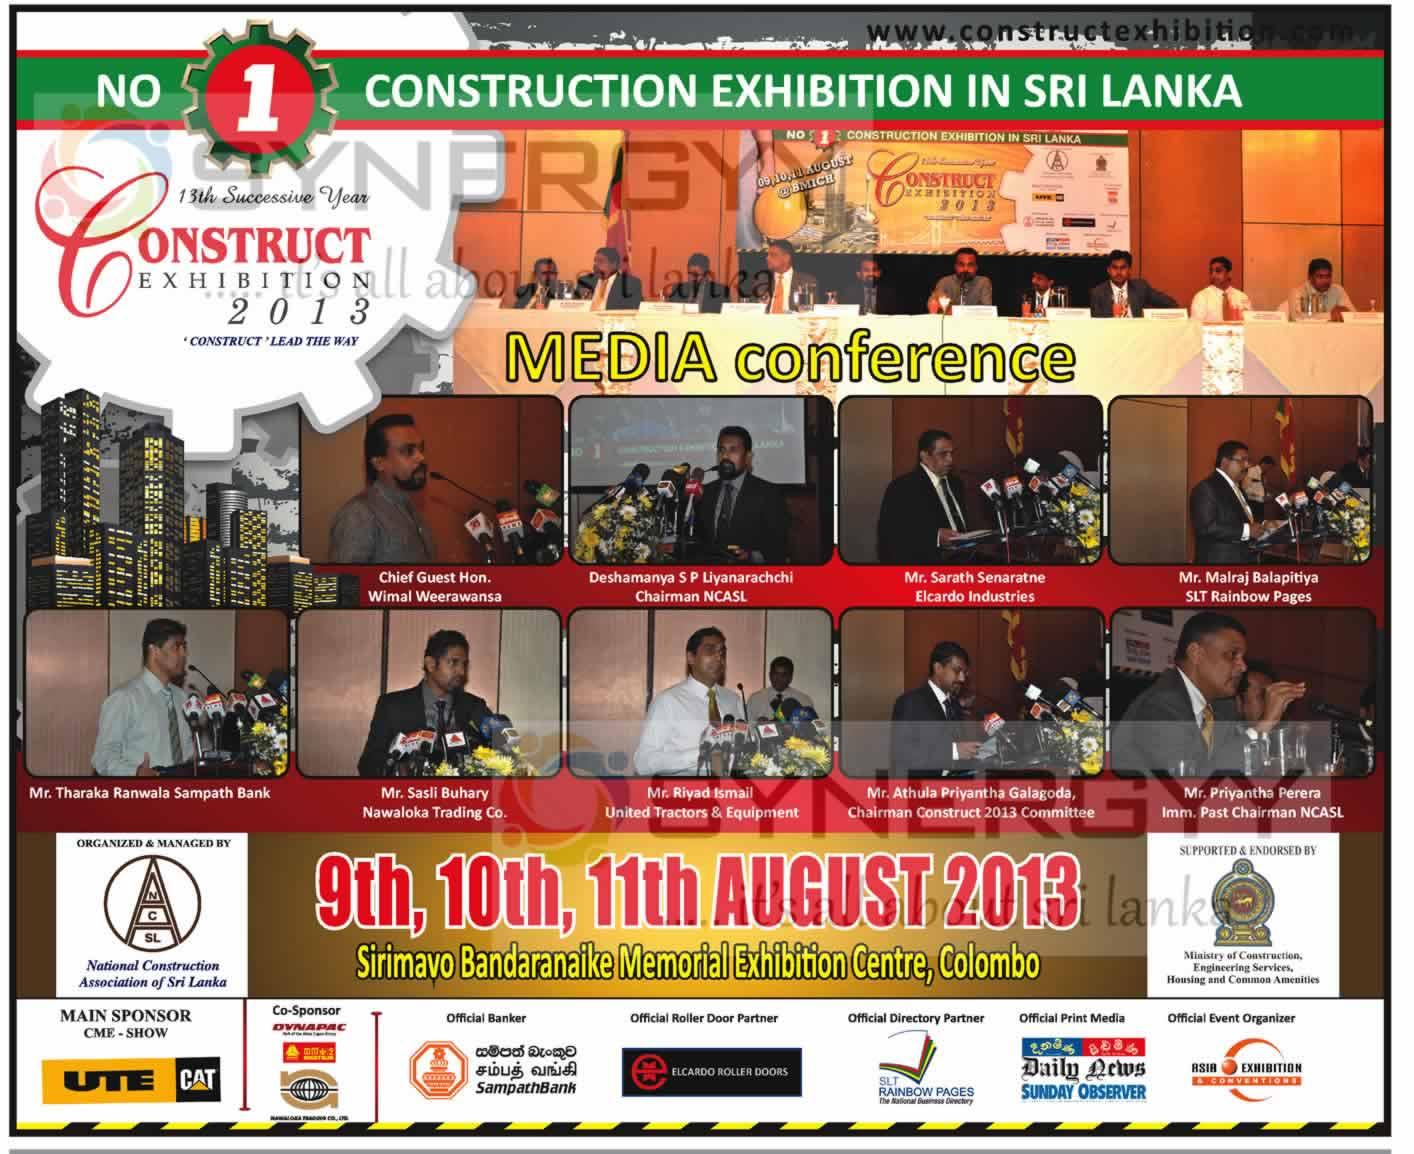 Exhibition Stall Builders In Sri Lanka : Construction exhibition in sri lanka « synergyy